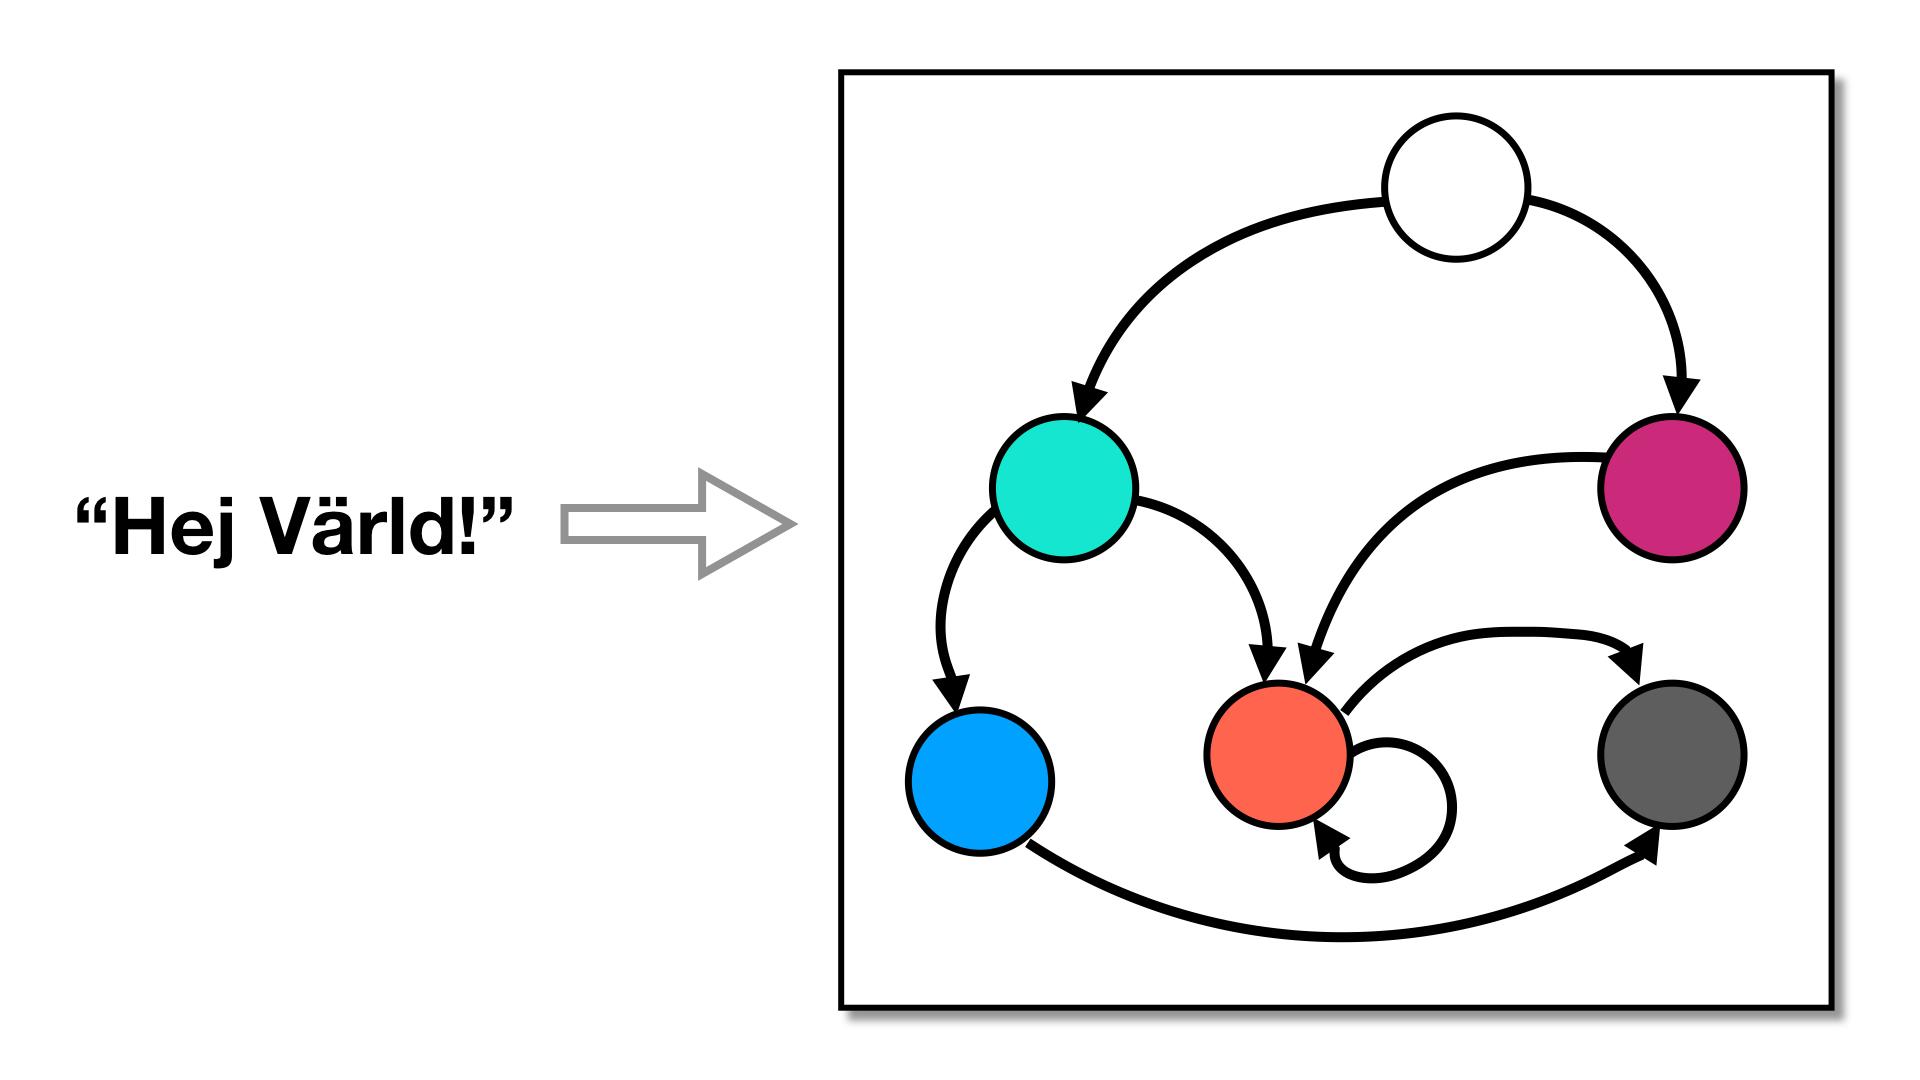 EncodeLiterals